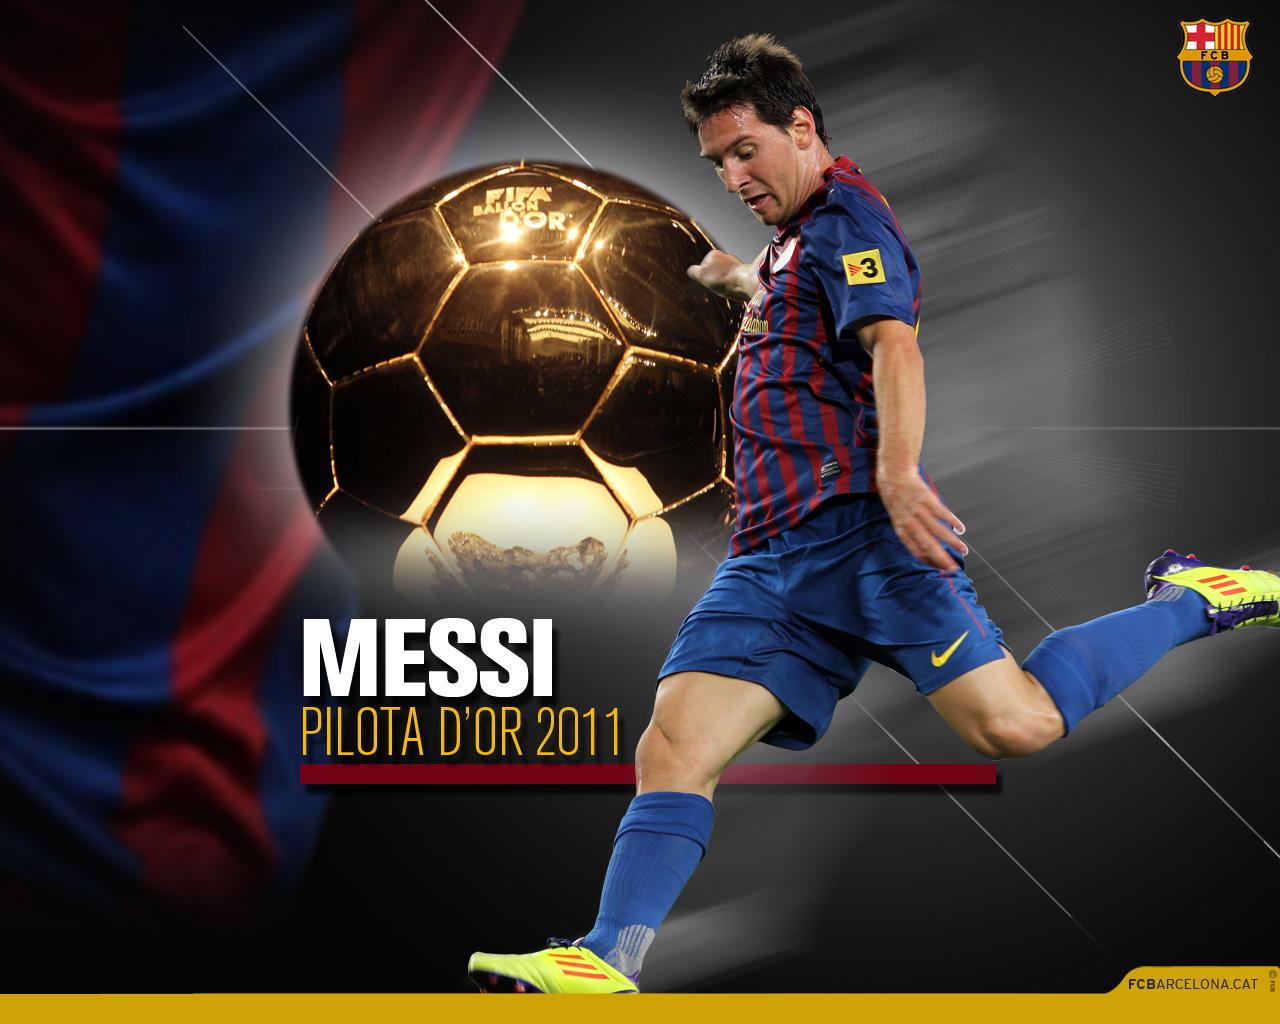 The Best Wallpaper Lionel Messi Ballon D'Or 2011